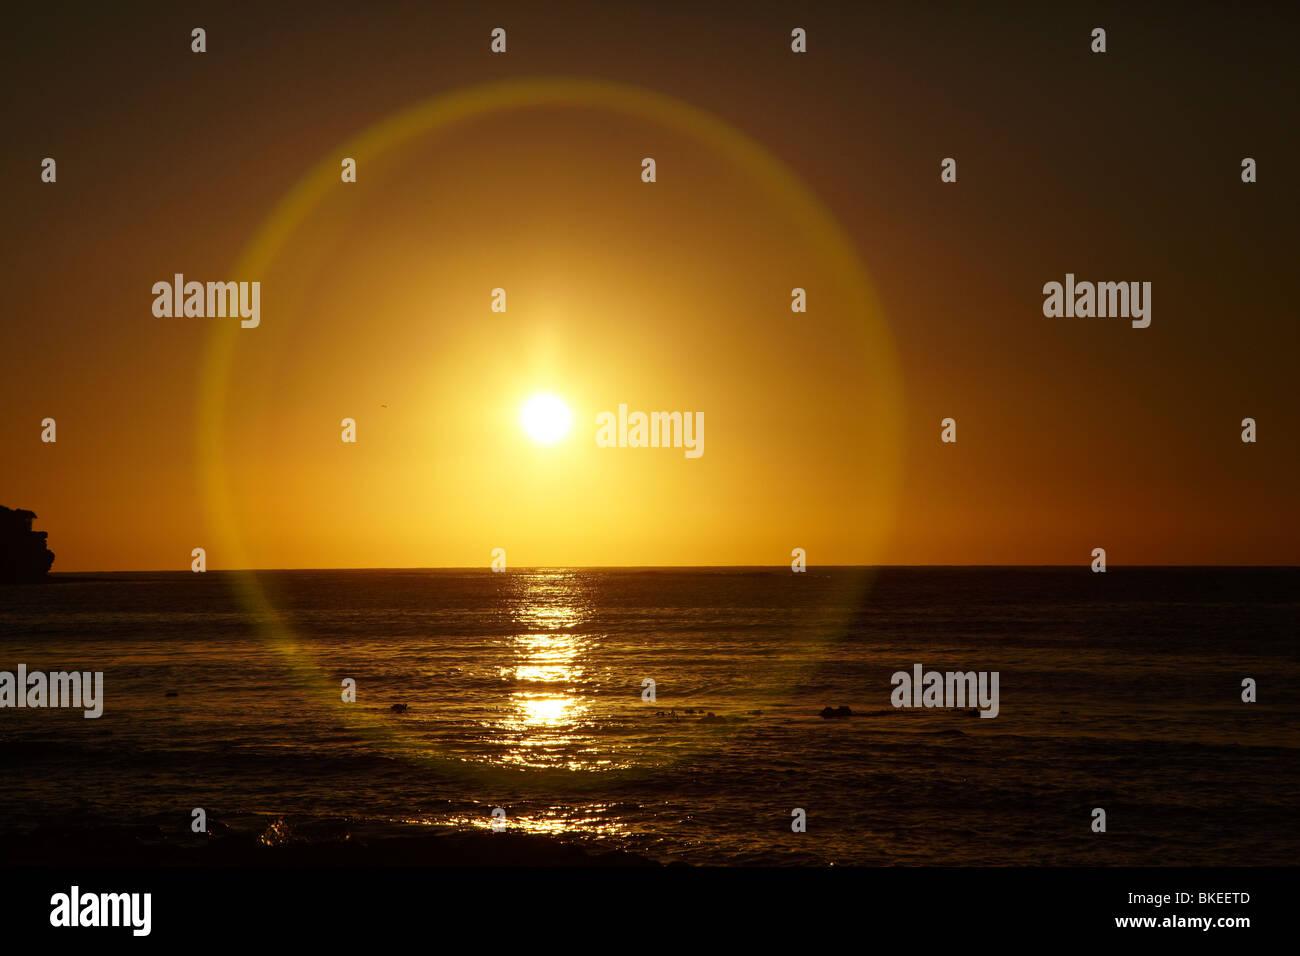 Lens Flare at Sunrise, Eaglehawk Neck, Tasman Peninsula, Southern Tasmania, Australia - Stock Image